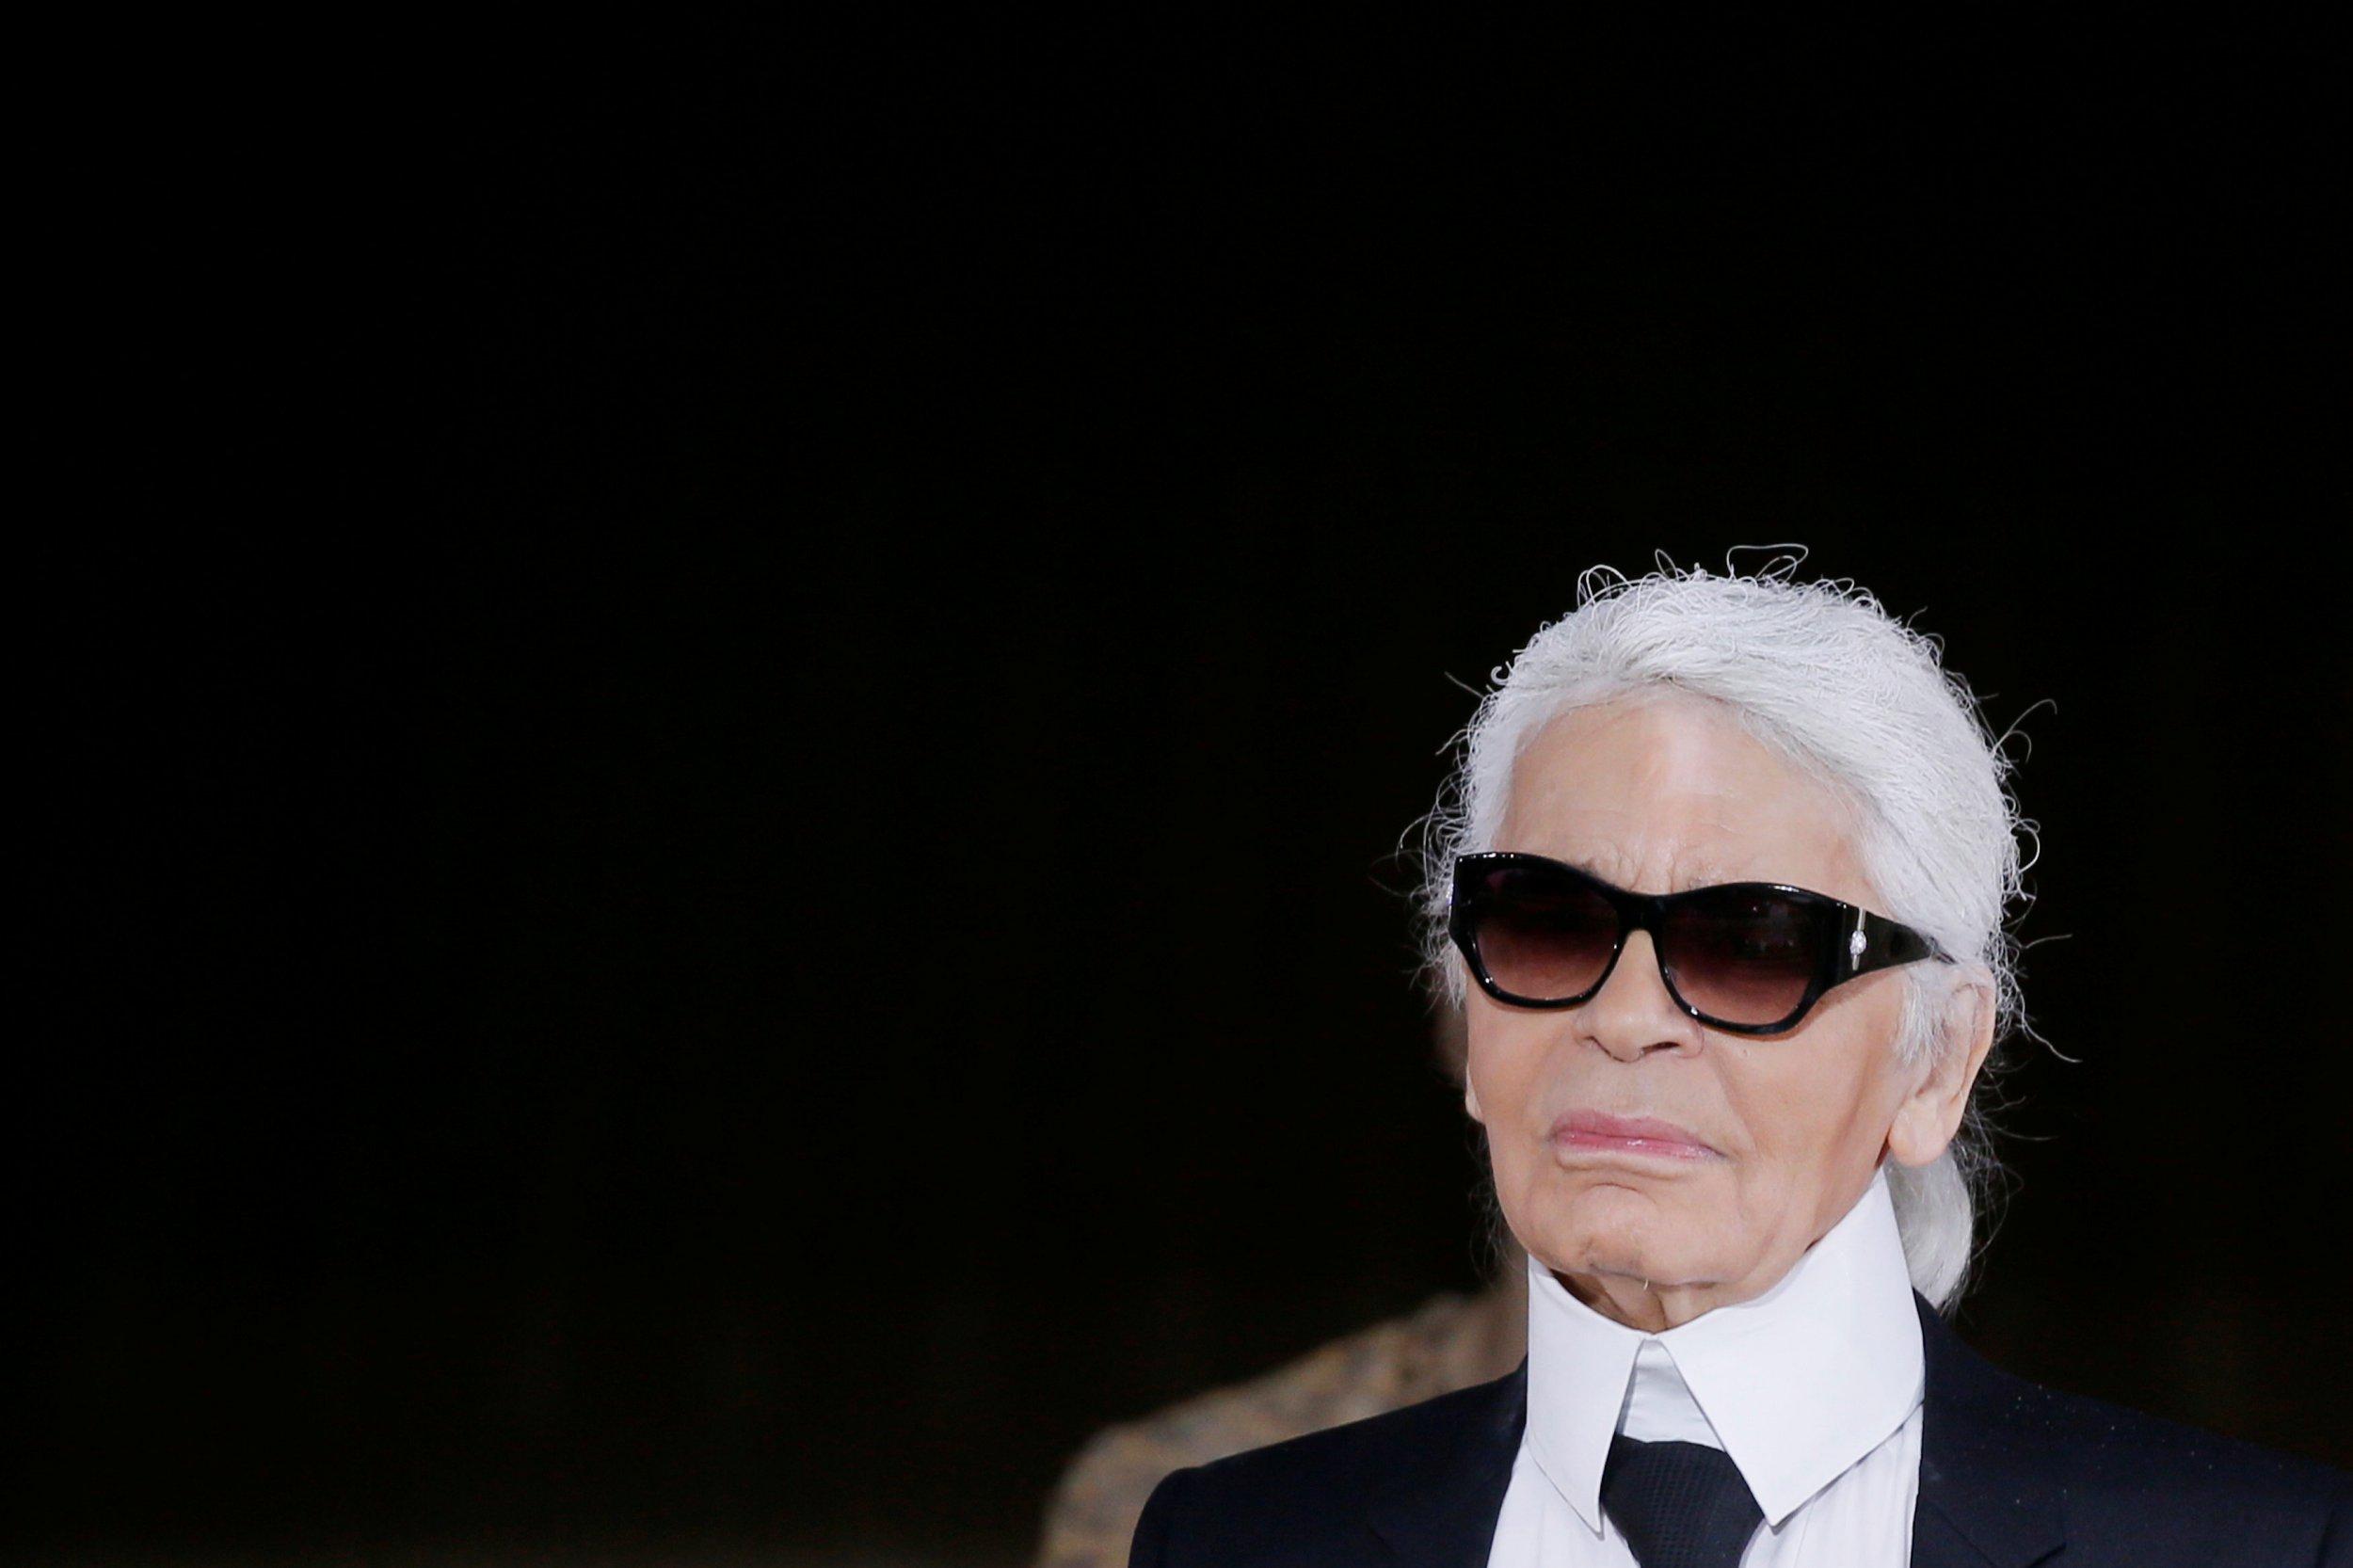 Chanel designer Karl Lagerfeld dead at 85